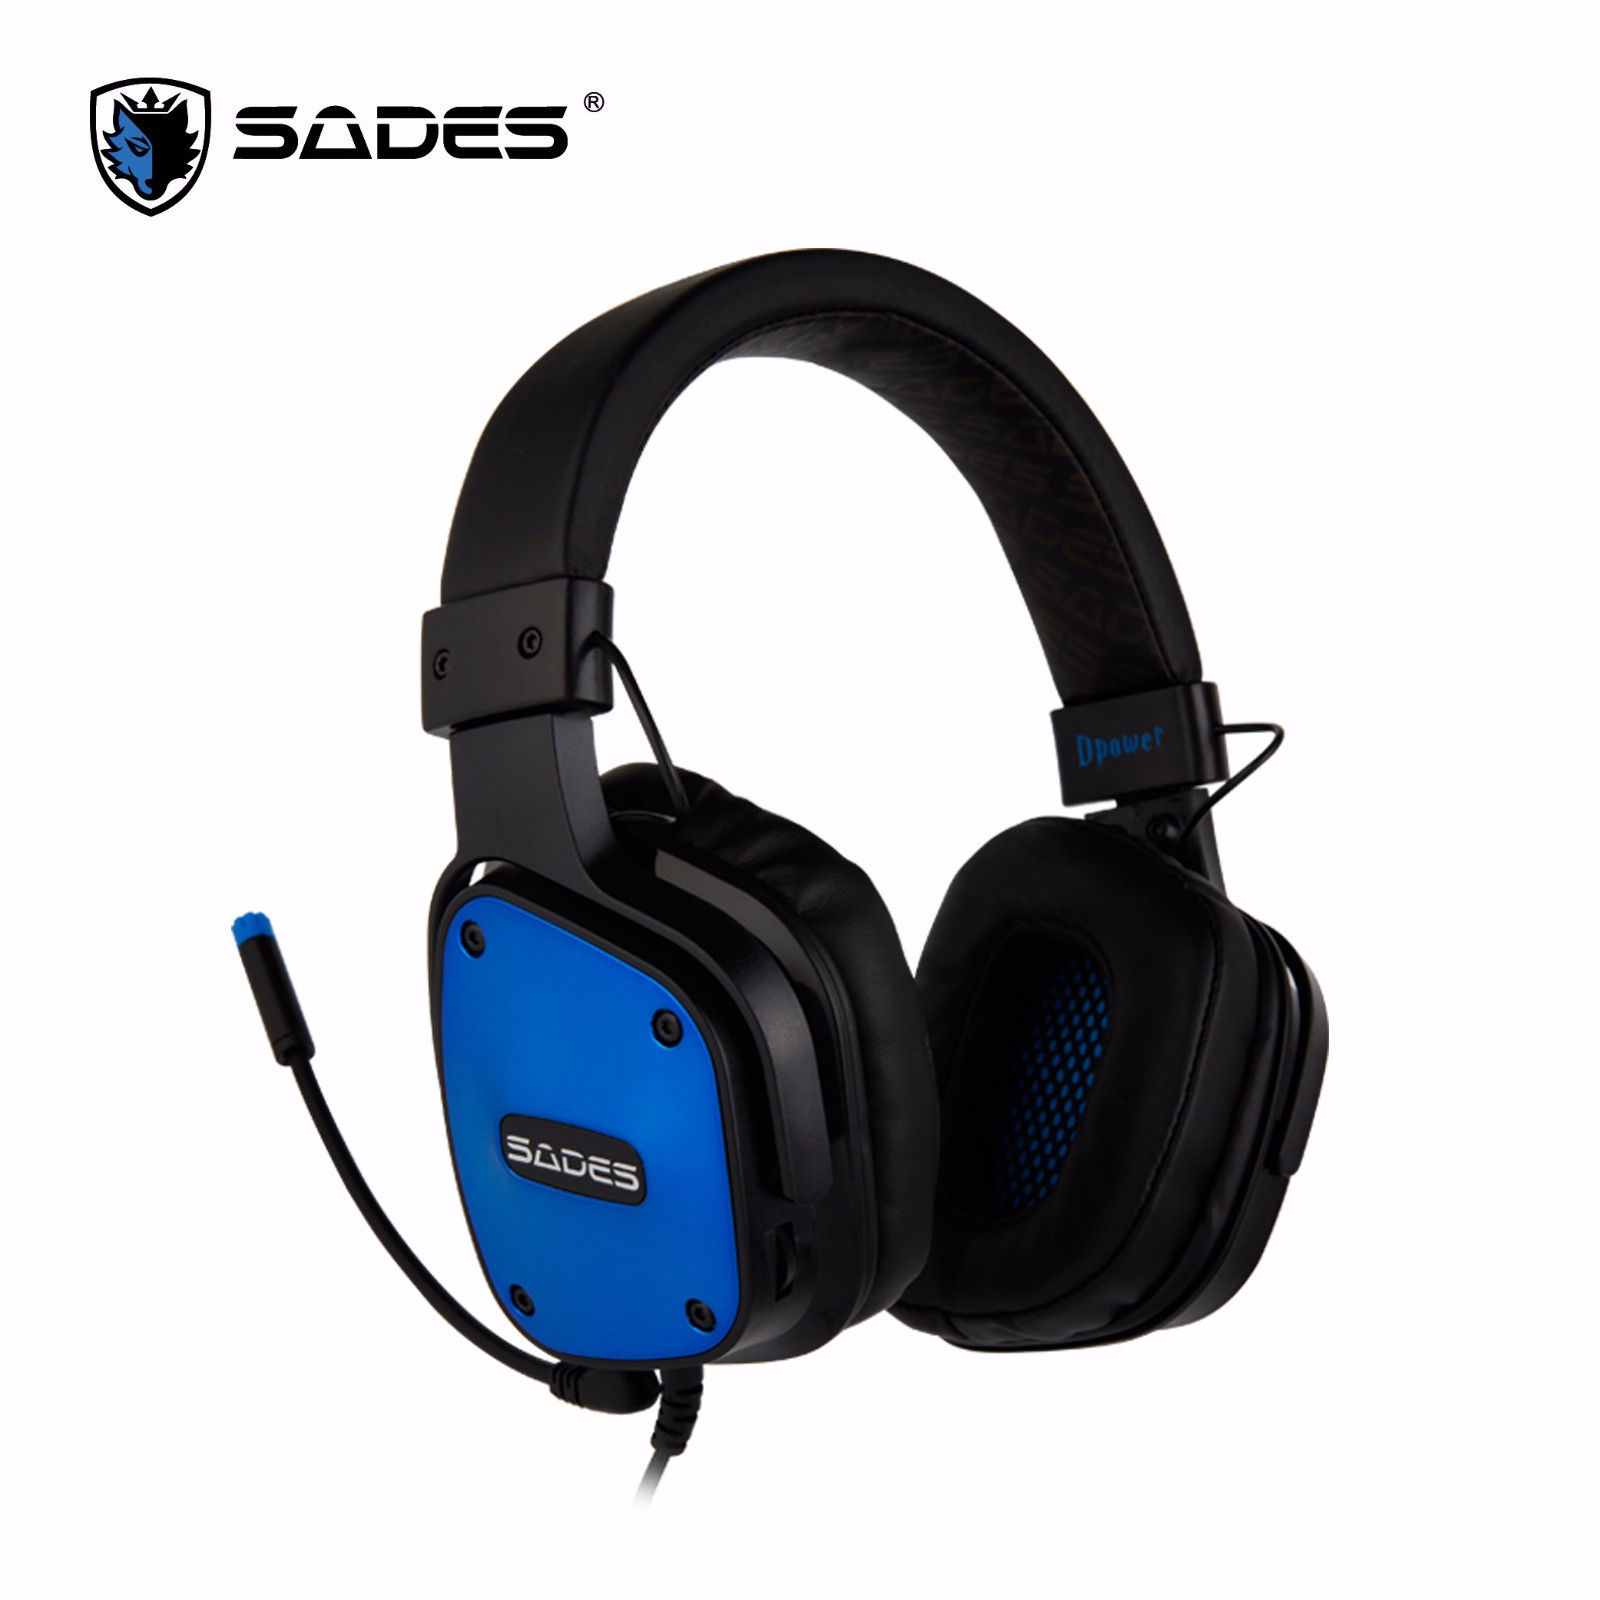 Sades Dpower Video Gaming Headset Usd395 T Power Sa 701